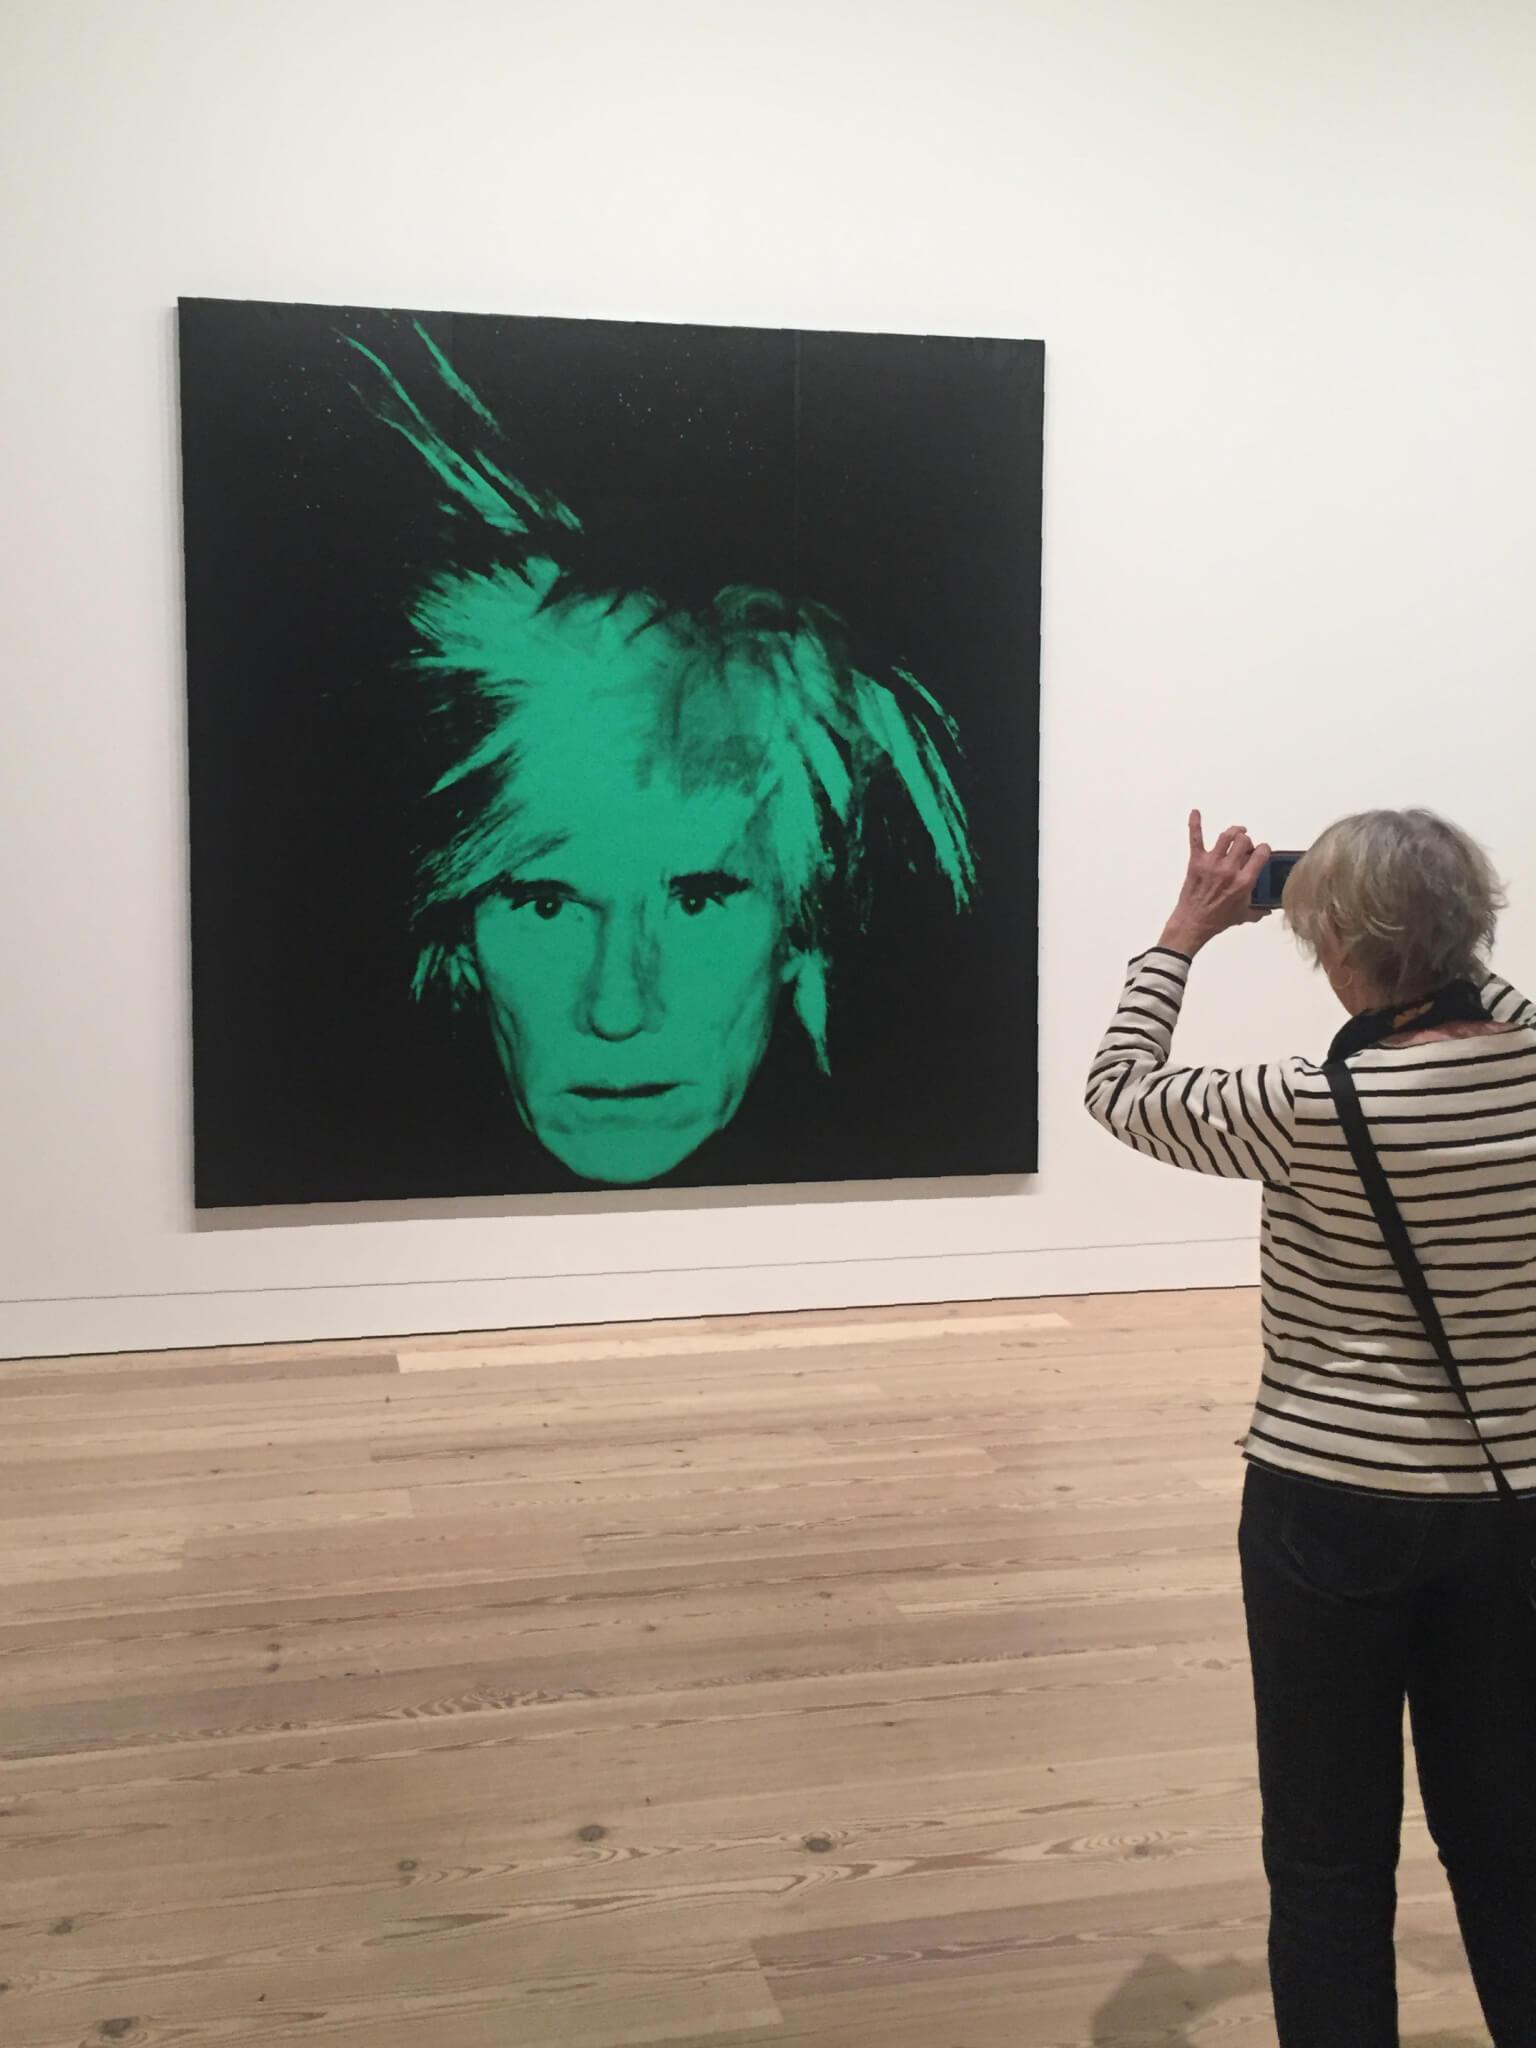 Warhol認為每個人的藝術都有價值,然而,他的名氣維持了為數多個十五分鐘,至今仍無退減,他的藝術風格被後世模仿,為藝術界開拓一條全新的道路。